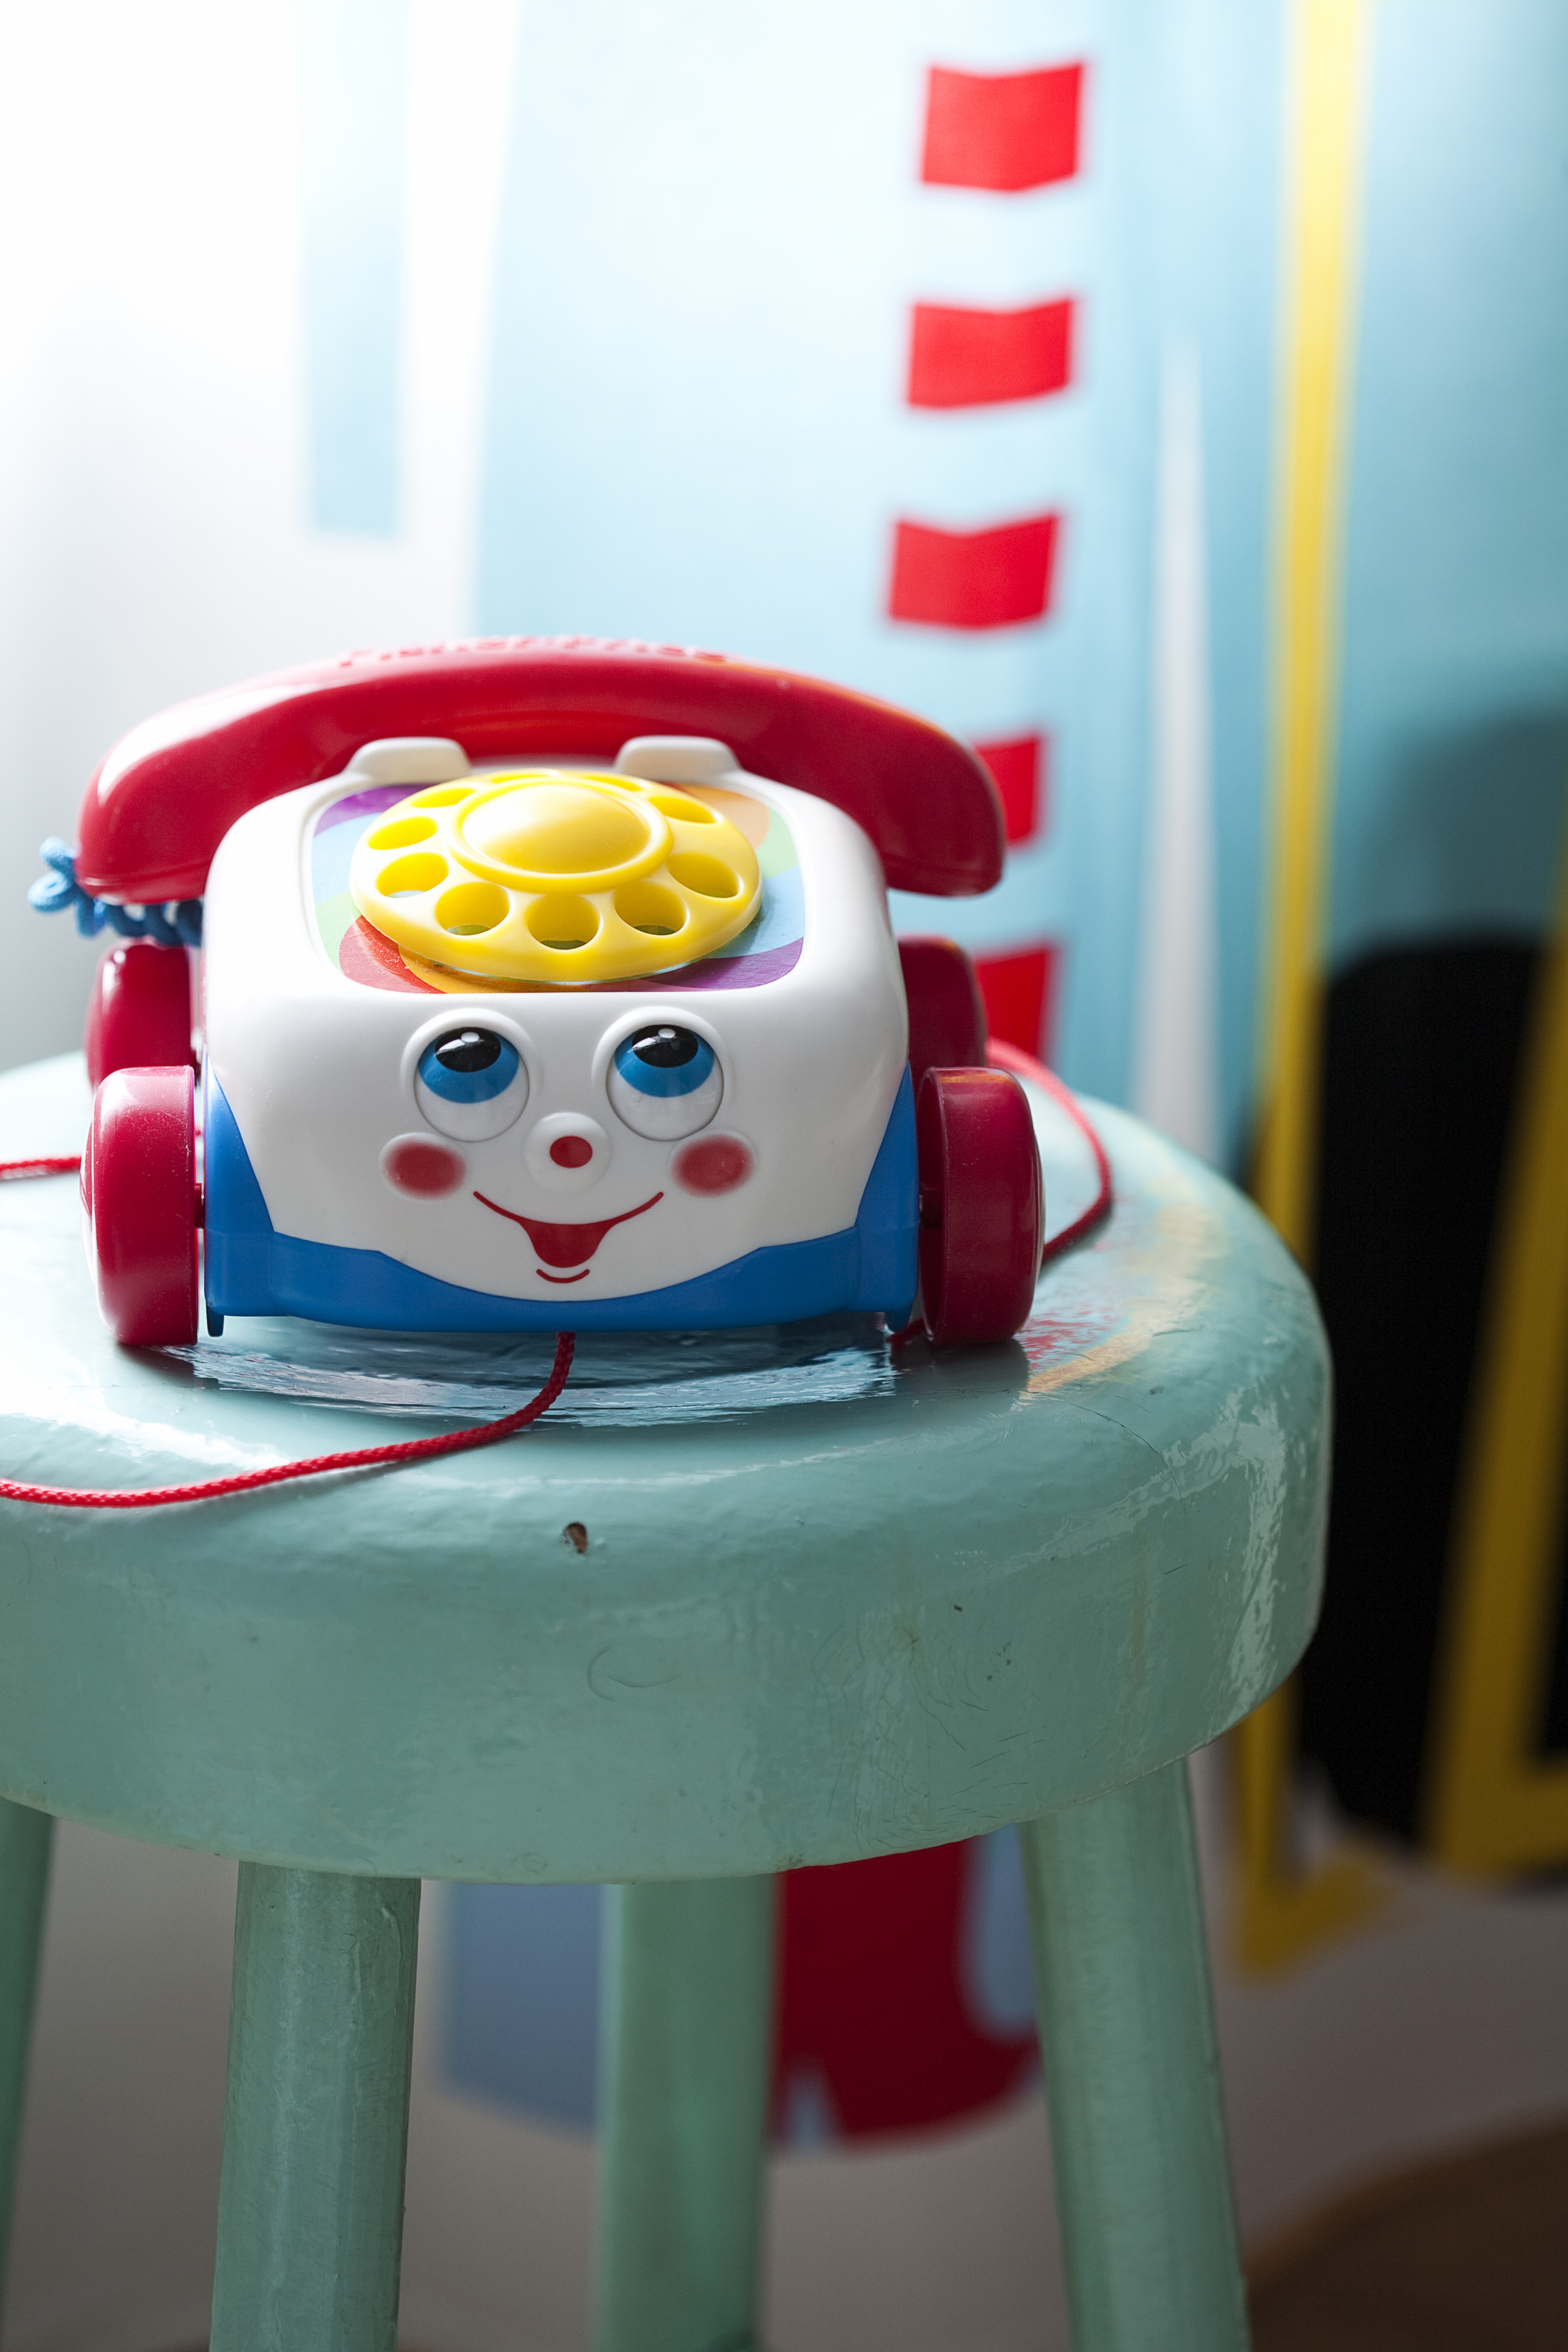 Vanhet lelut puhelin